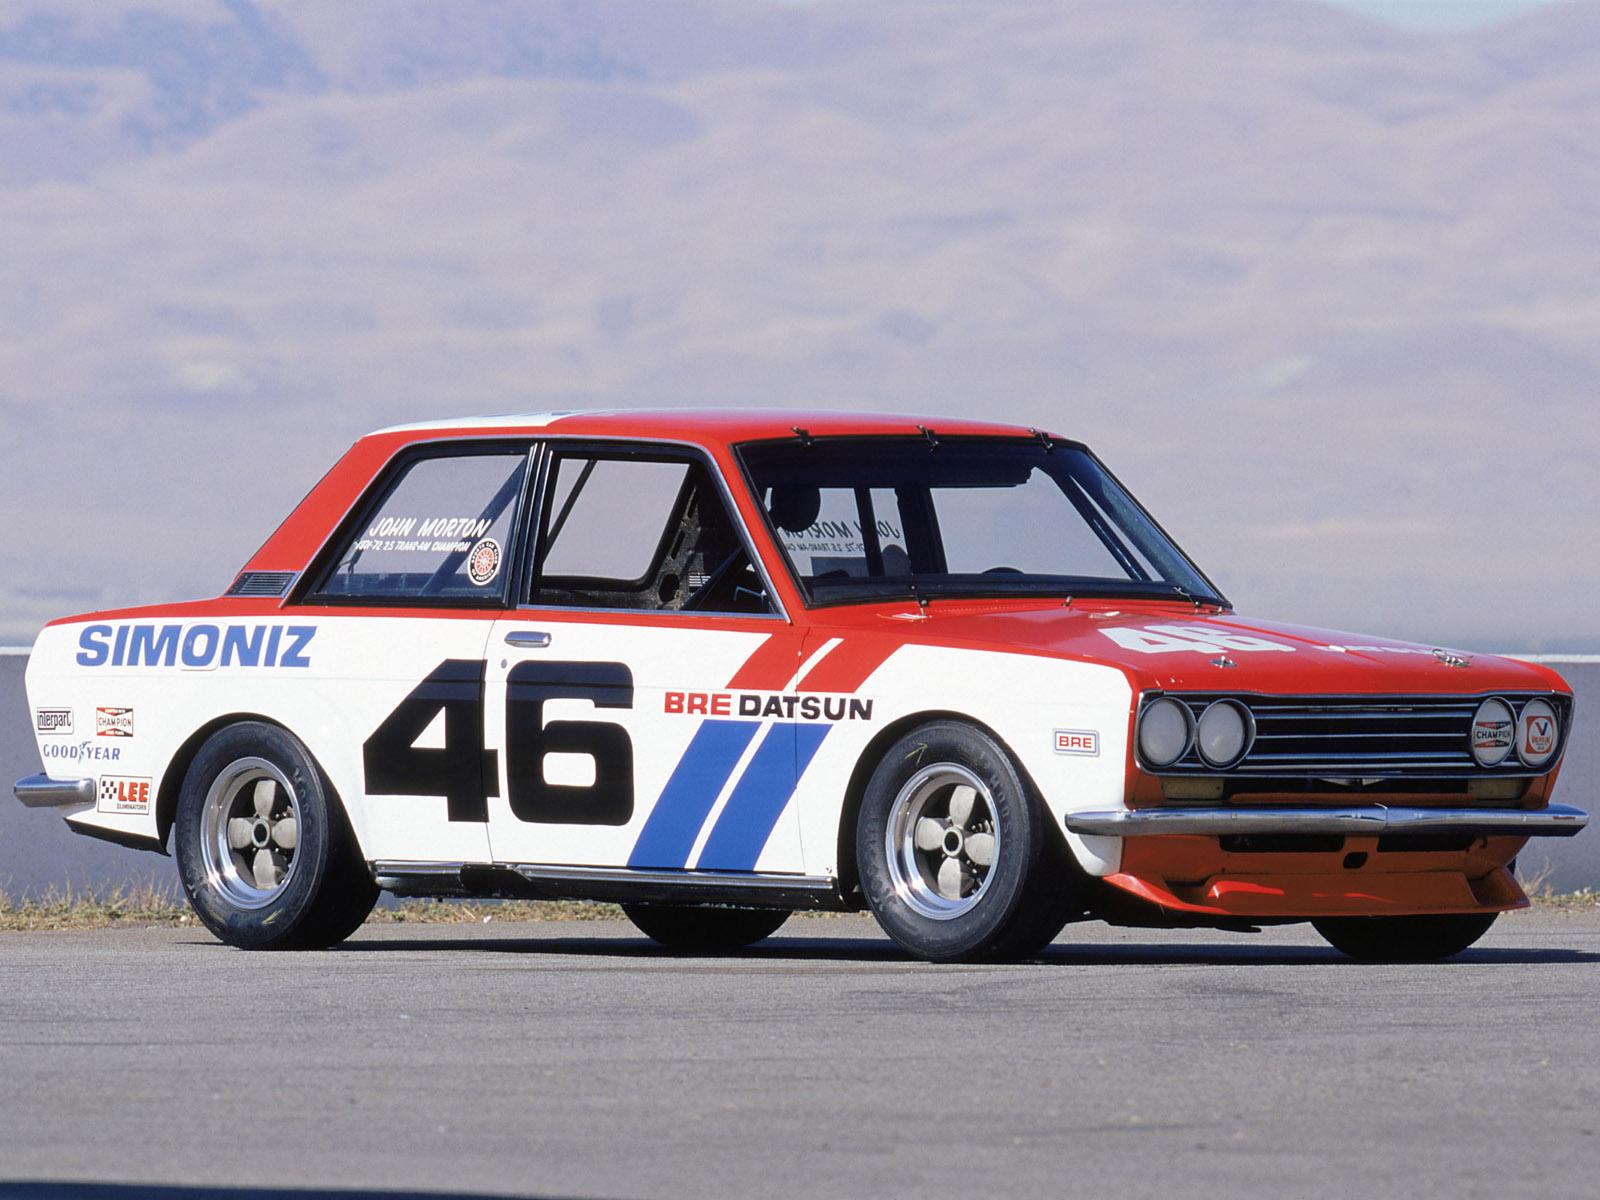 video against all odds datsun 510 bre racing motorsport retro